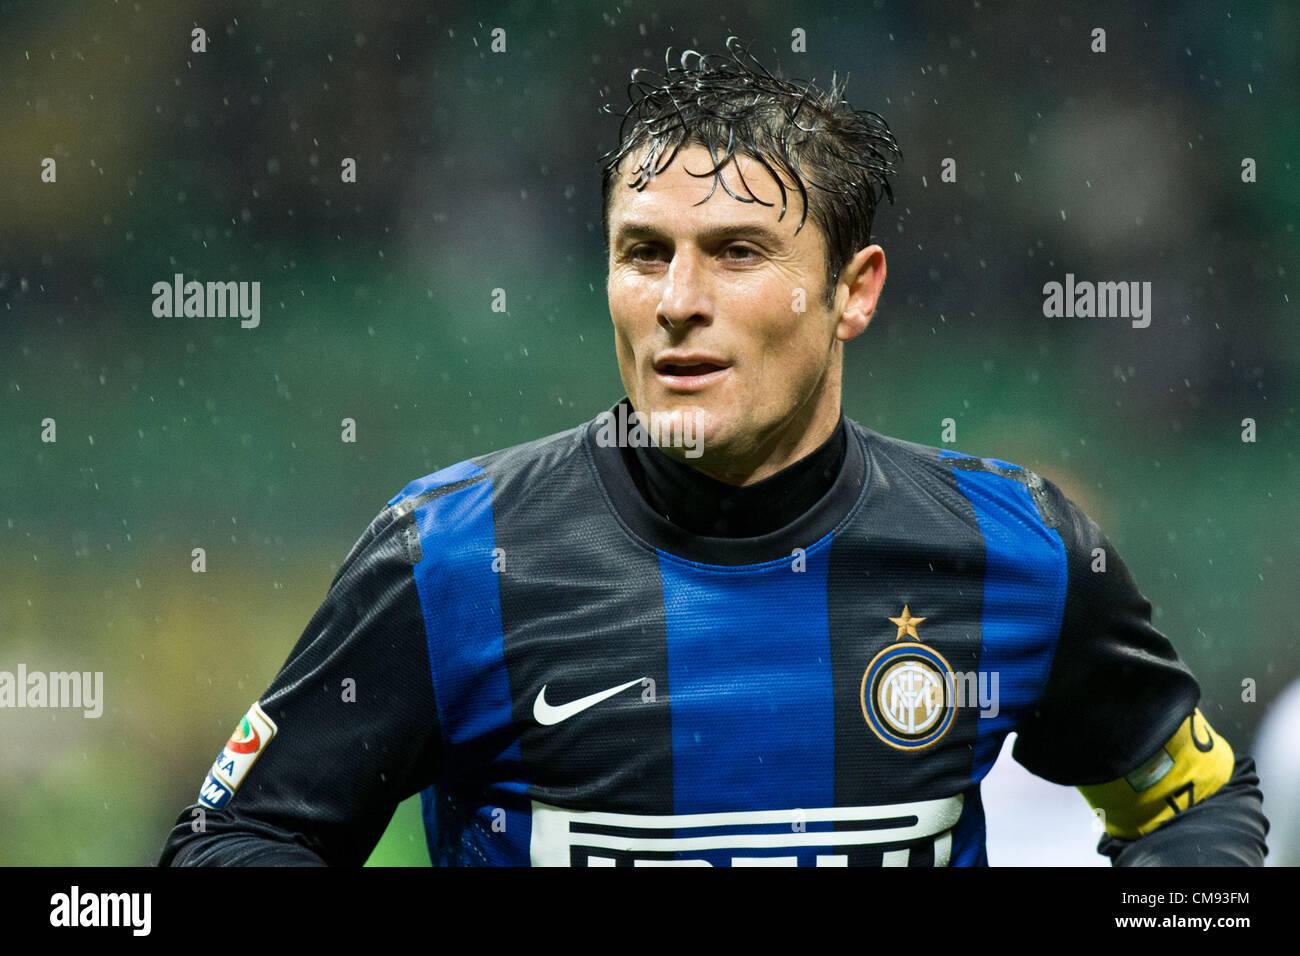 Javier Zanetti Inter OCTOBER 31 2012 Football Soccer Stock